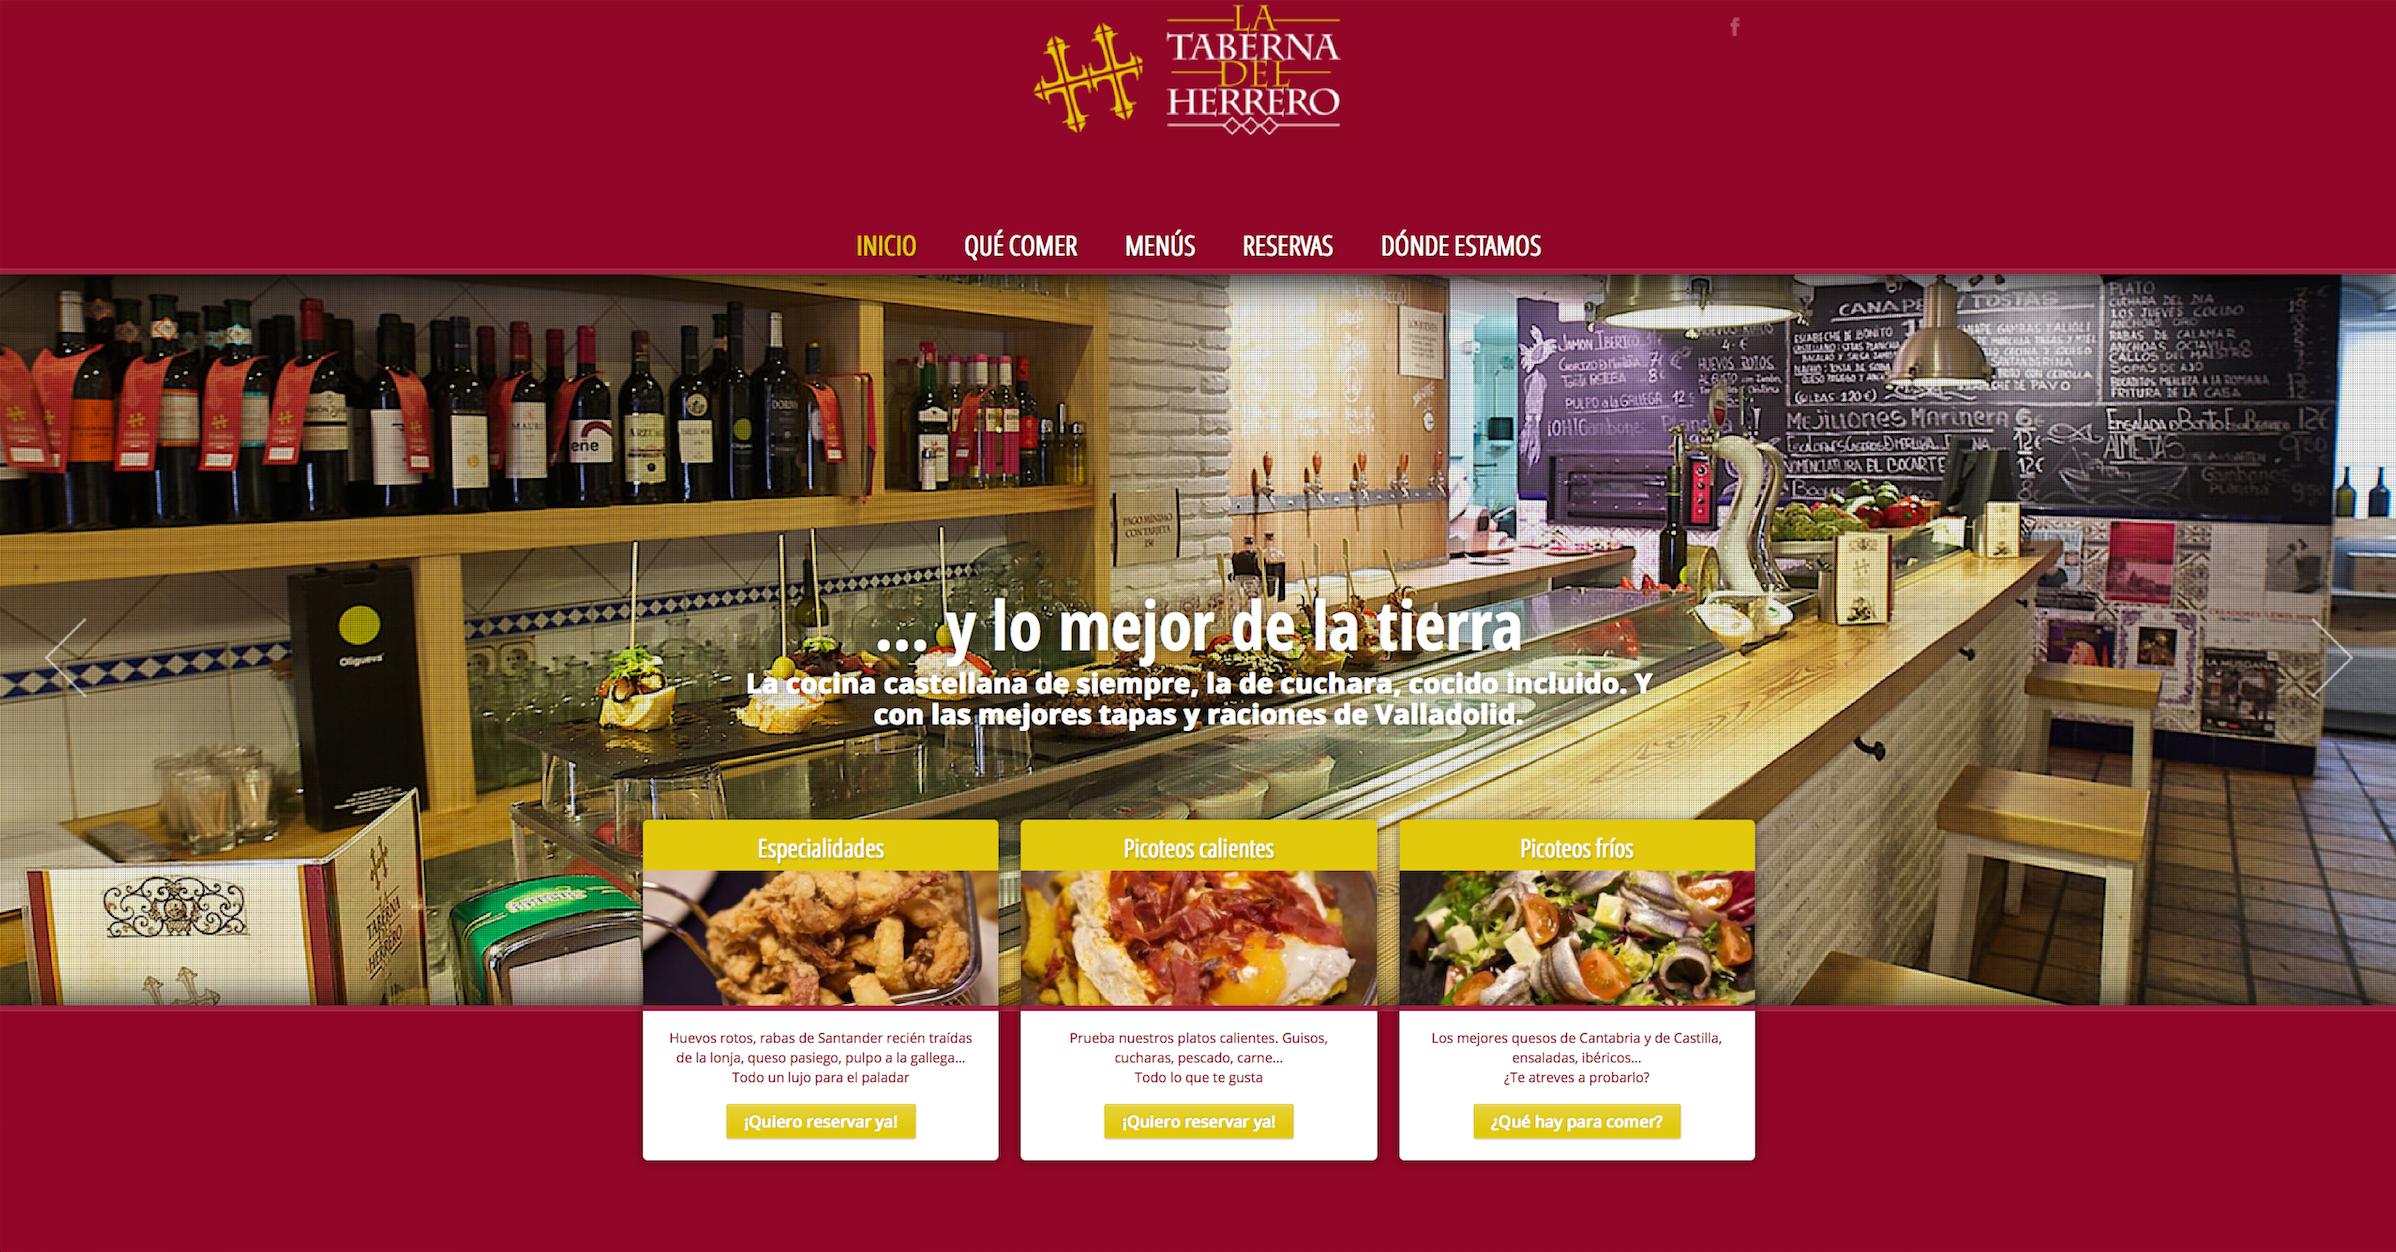 Taberna_del_herrero